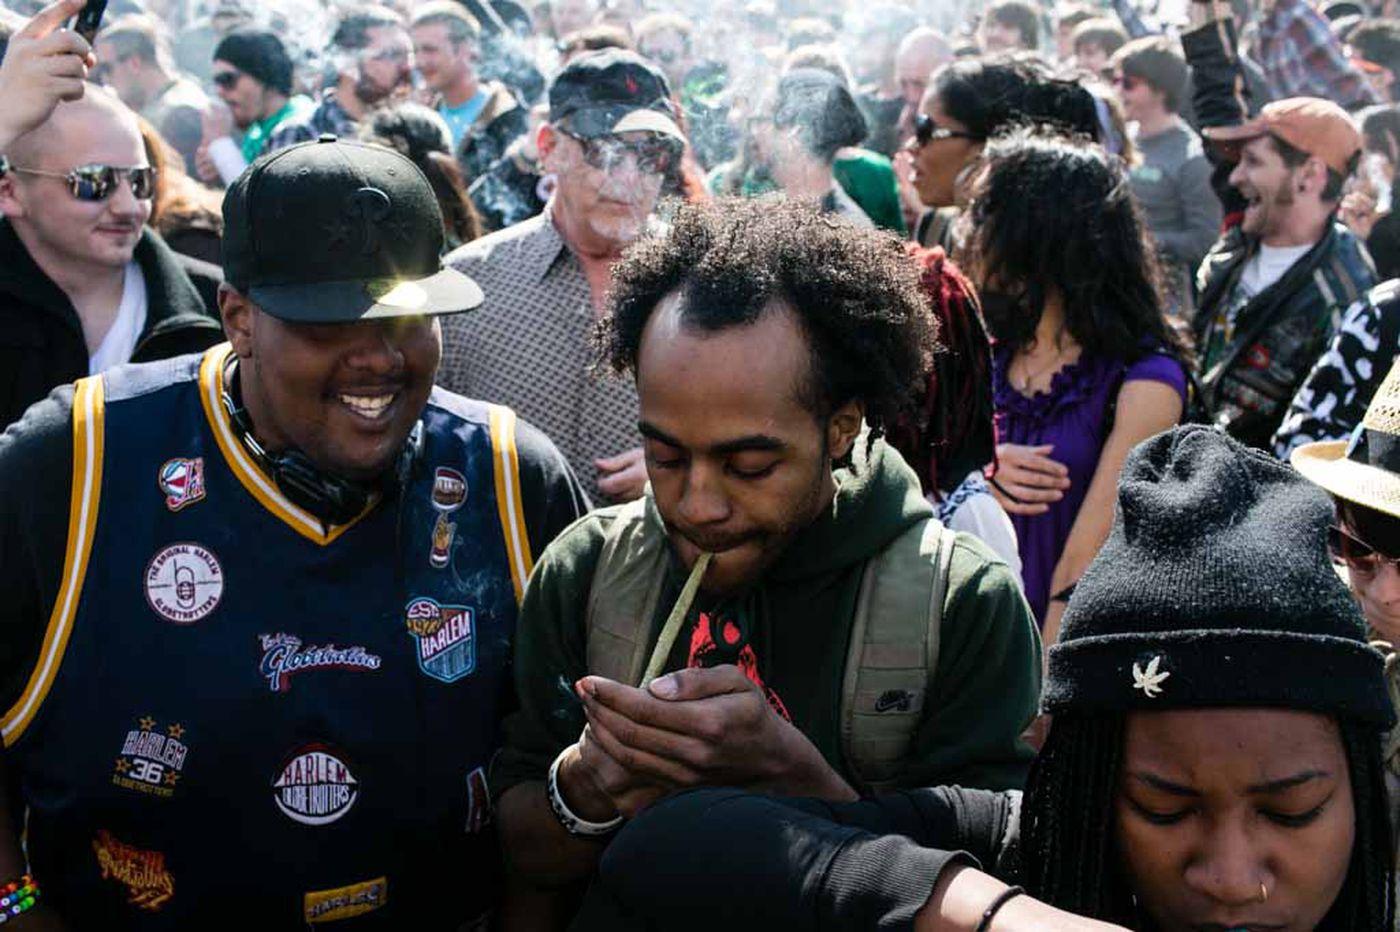 Legal weed debate in New Jersey now focuses on erasing discriminatory marijuana arrests